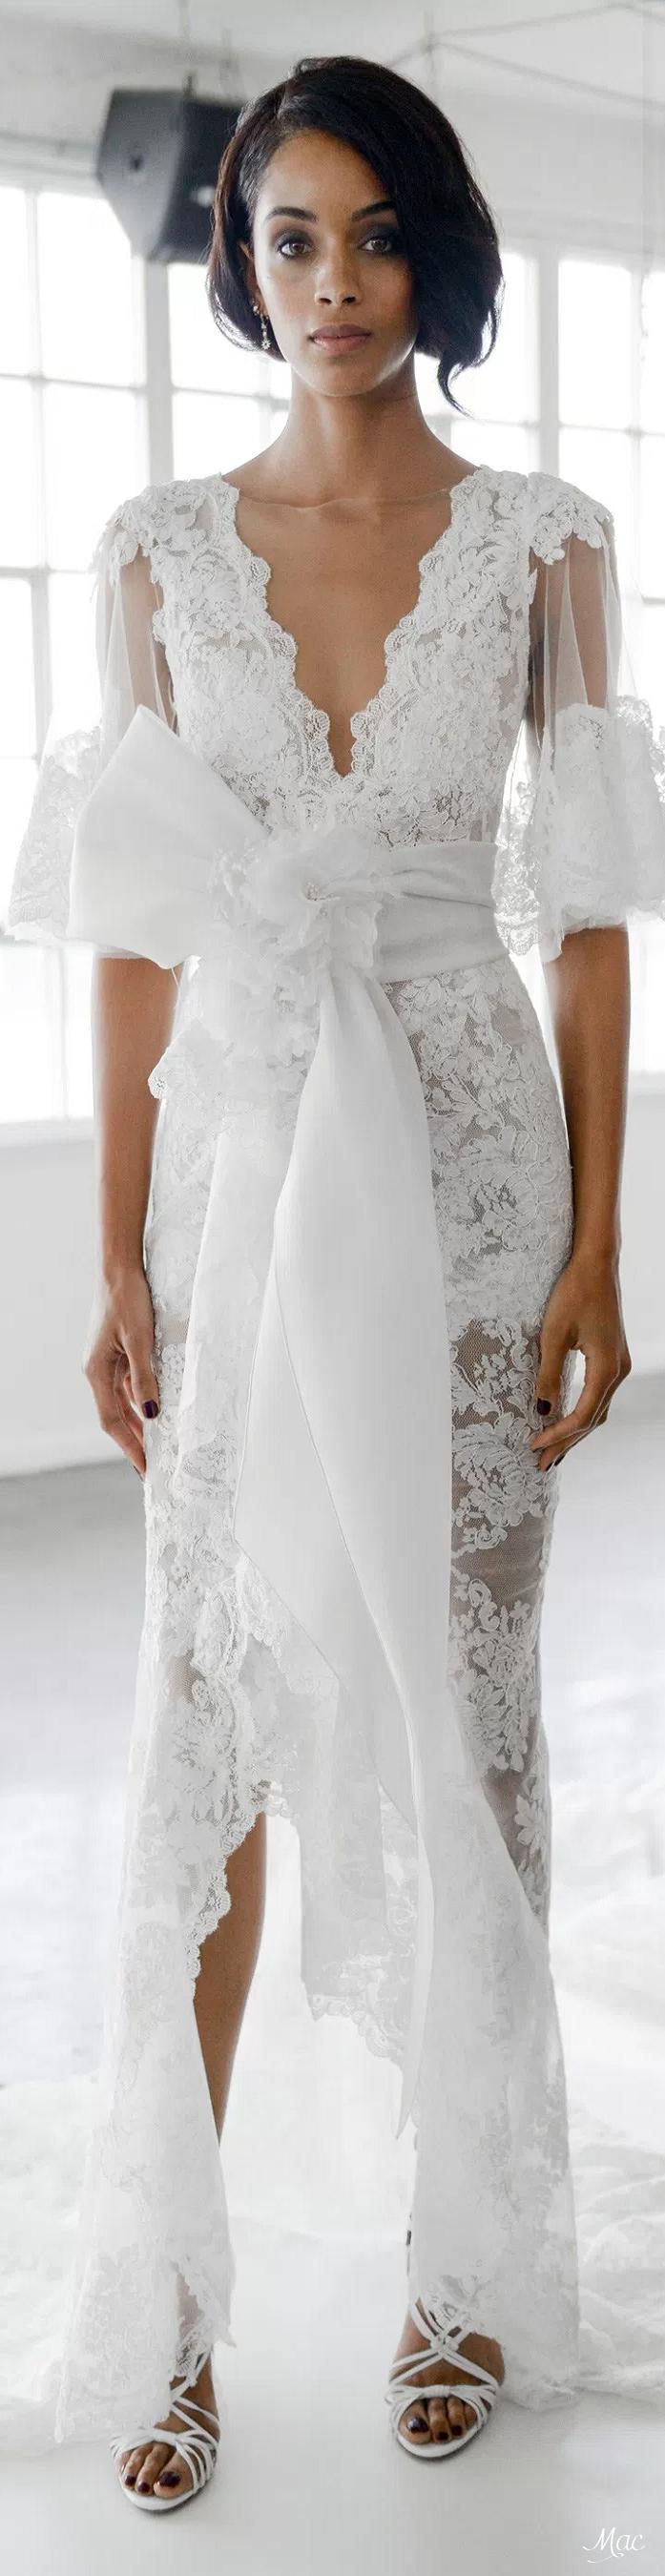 Fall bridal marchesa runway pinterest